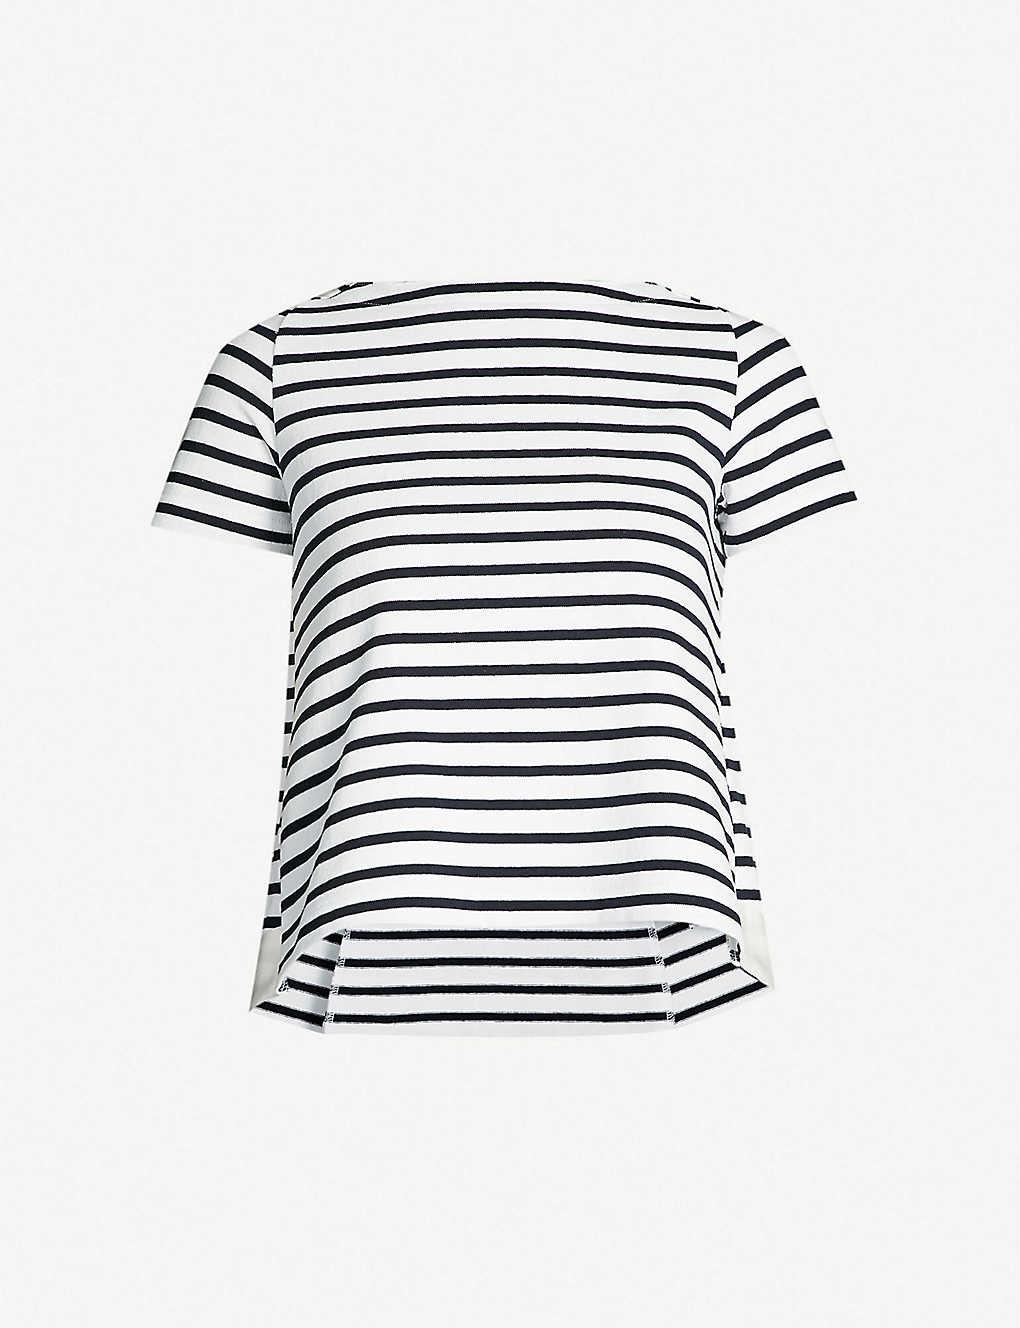 9d9b3cd3e0b Dixie striped cotton knitted T-shirt - Whitenavy ...